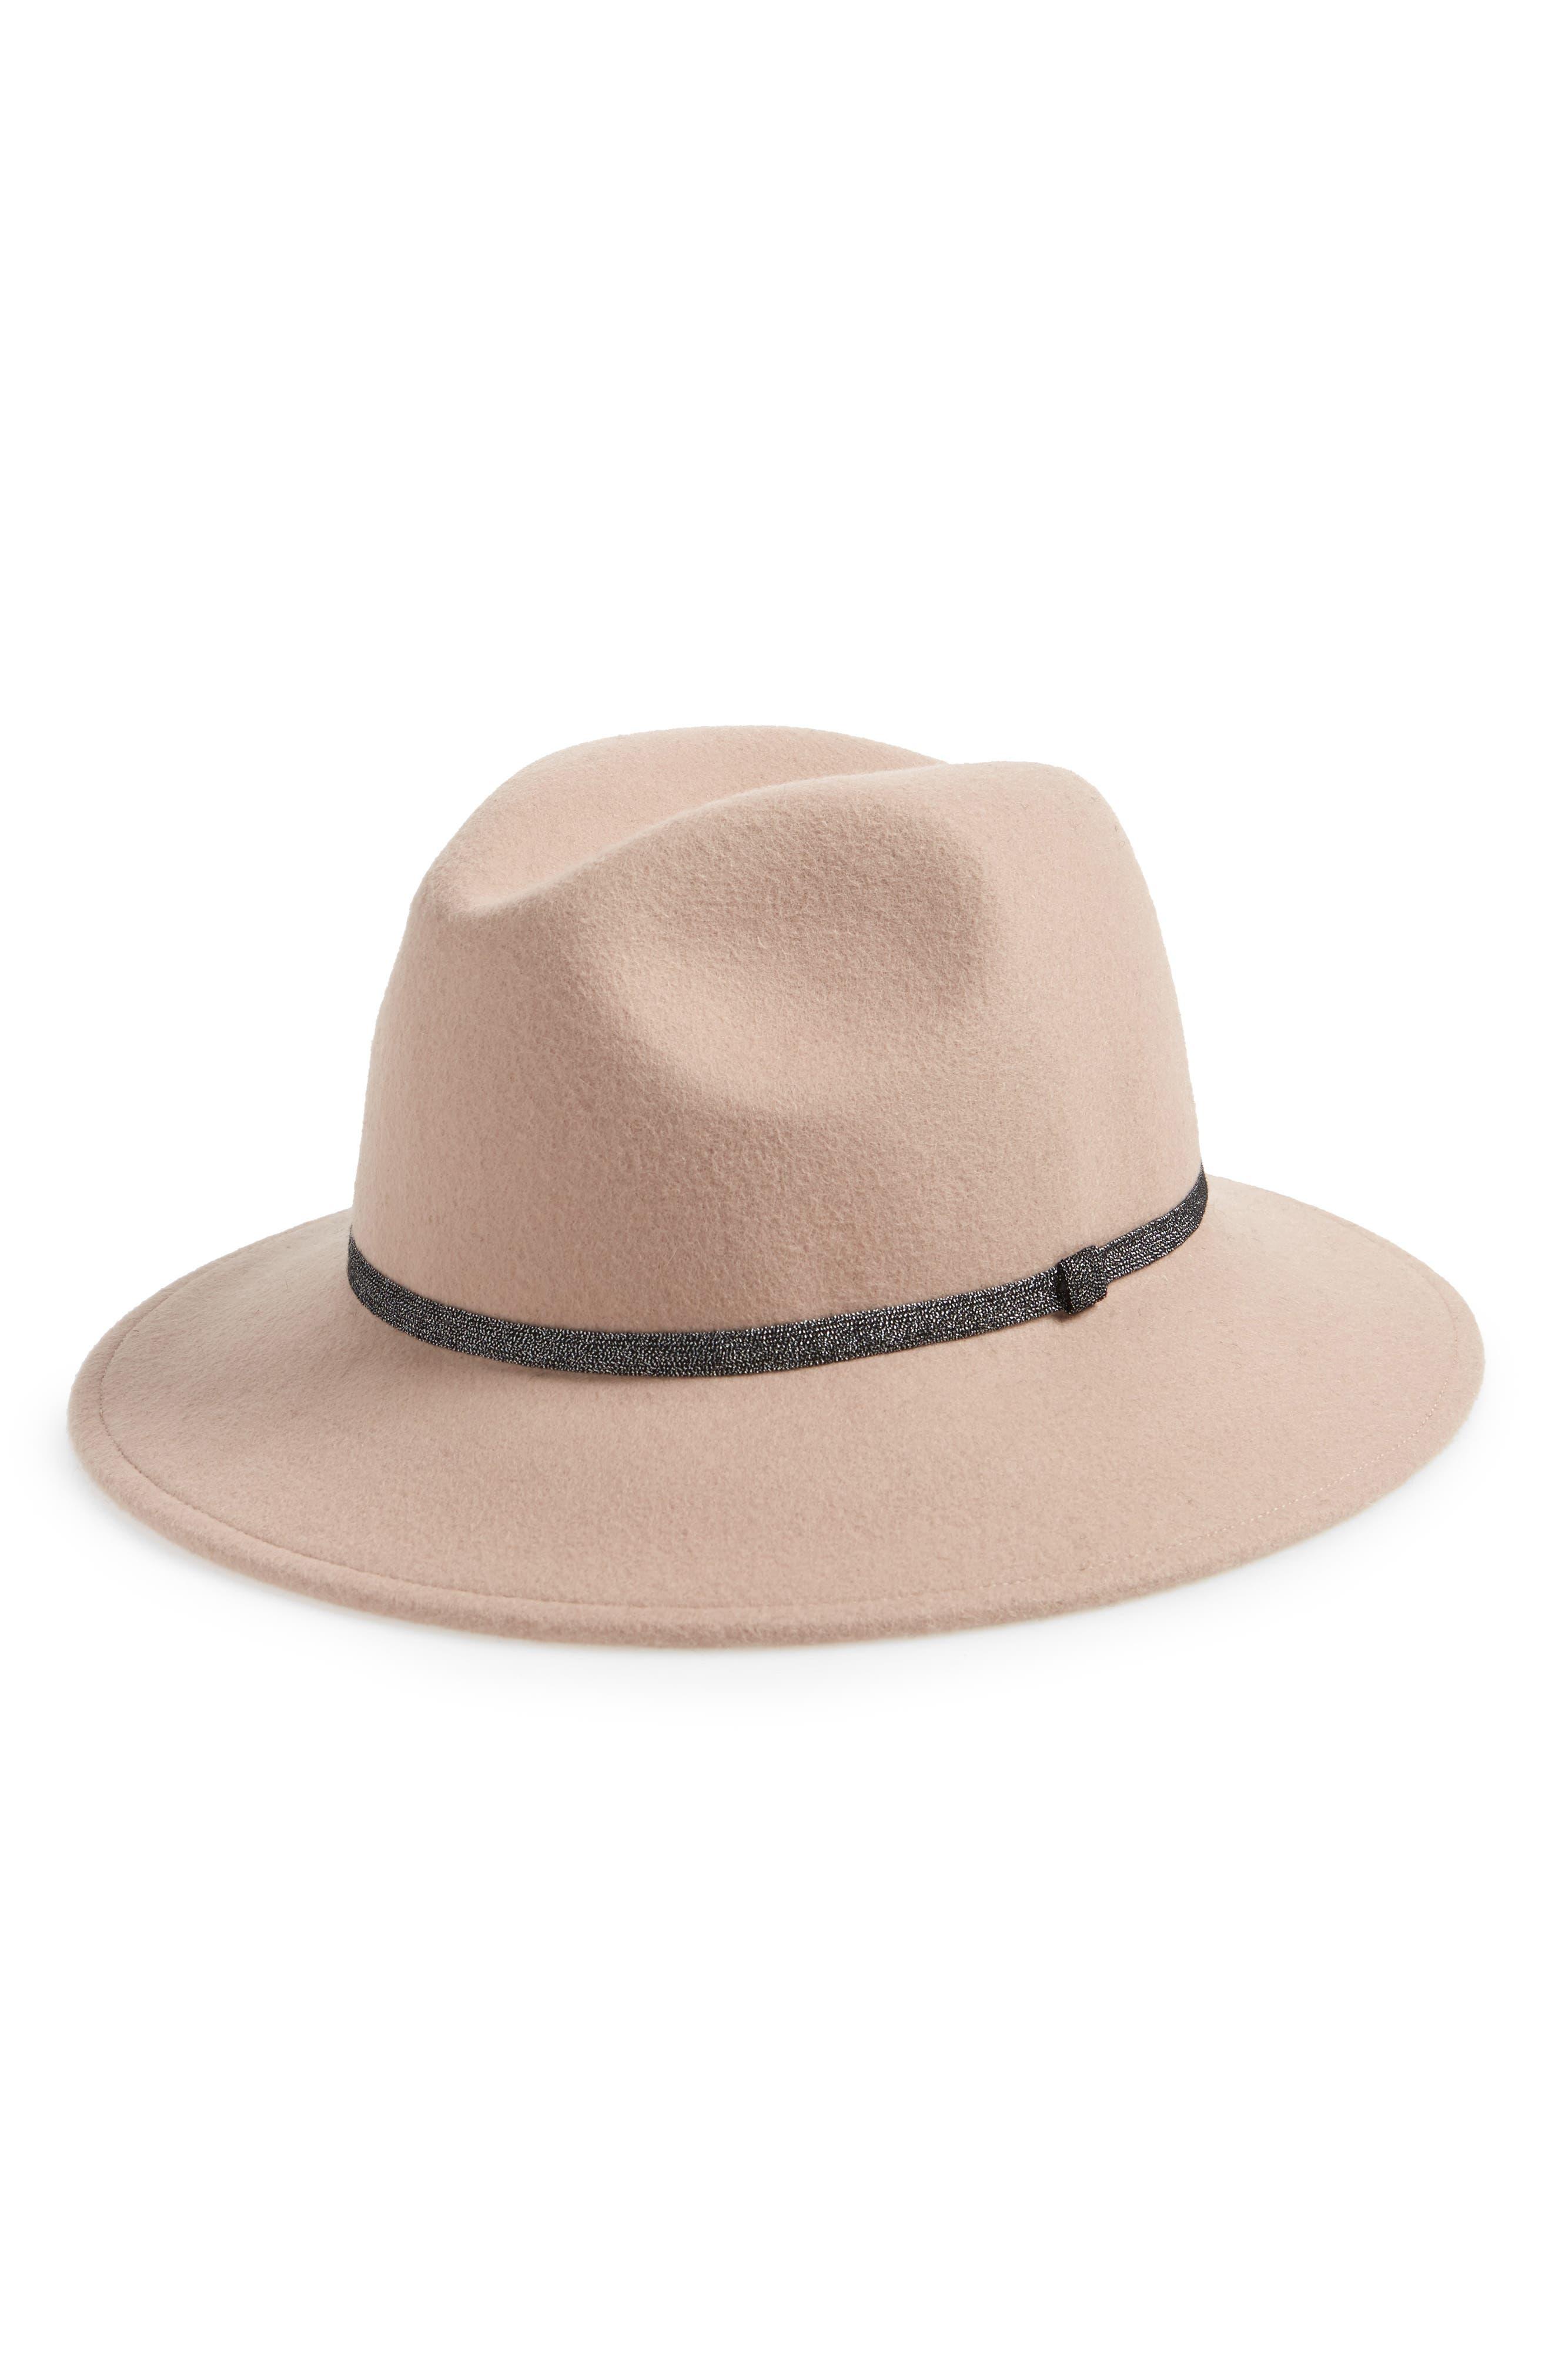 TREASURE & BOND, Metallic Band Wool Felt Panama Hat, Main thumbnail 1, color, 630